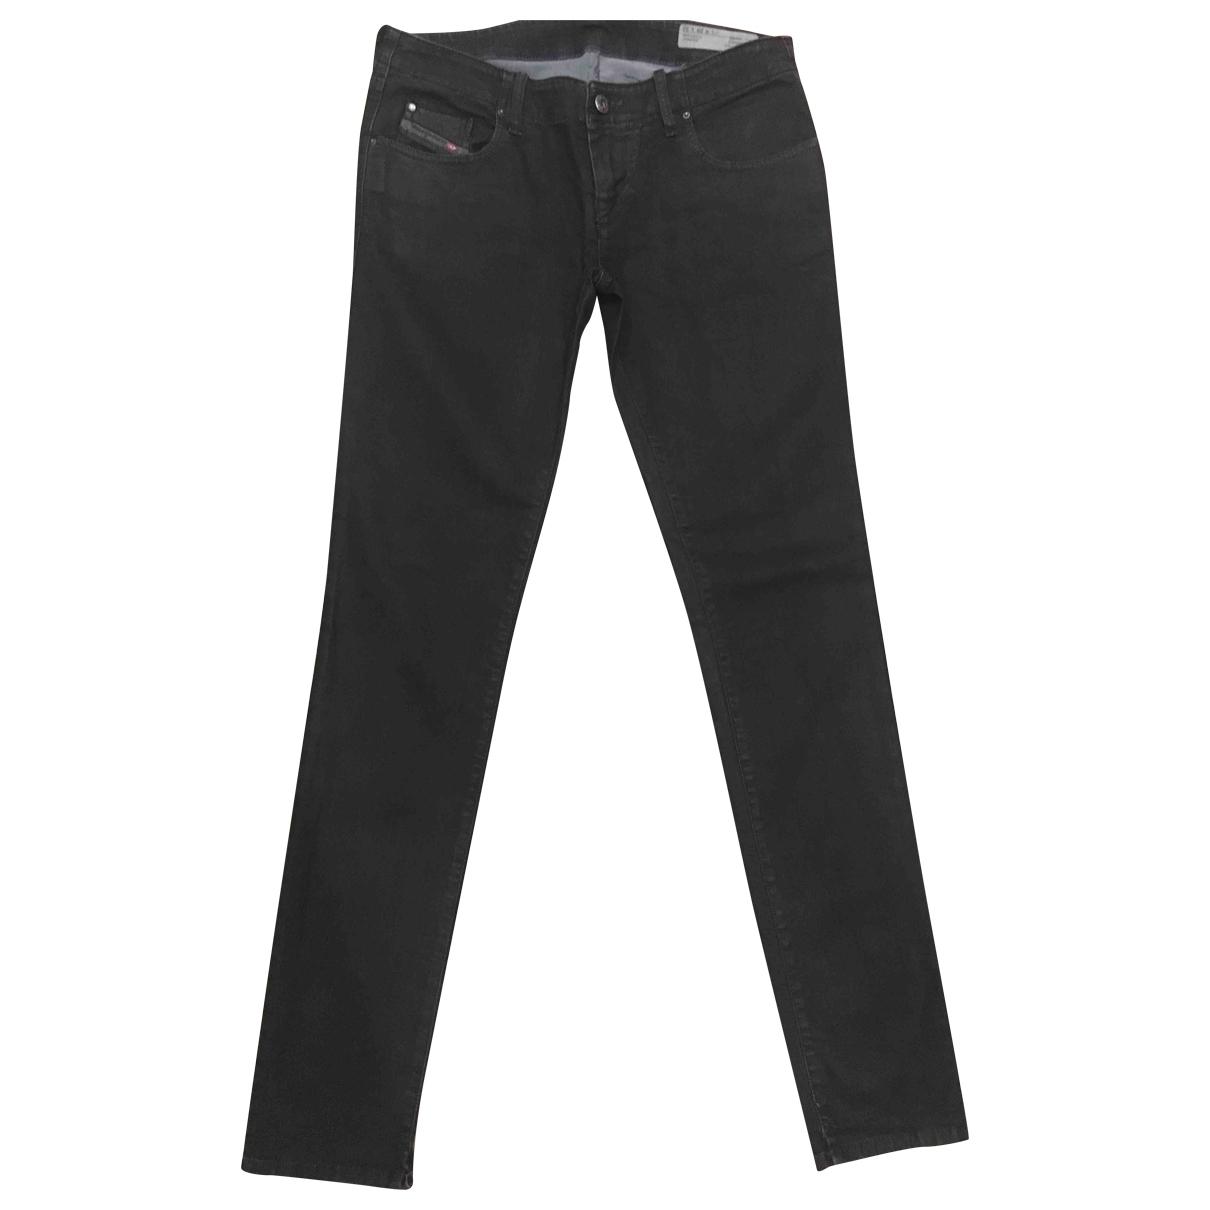 Diesel \N Black Cotton - elasthane Jeans for Women 29 US